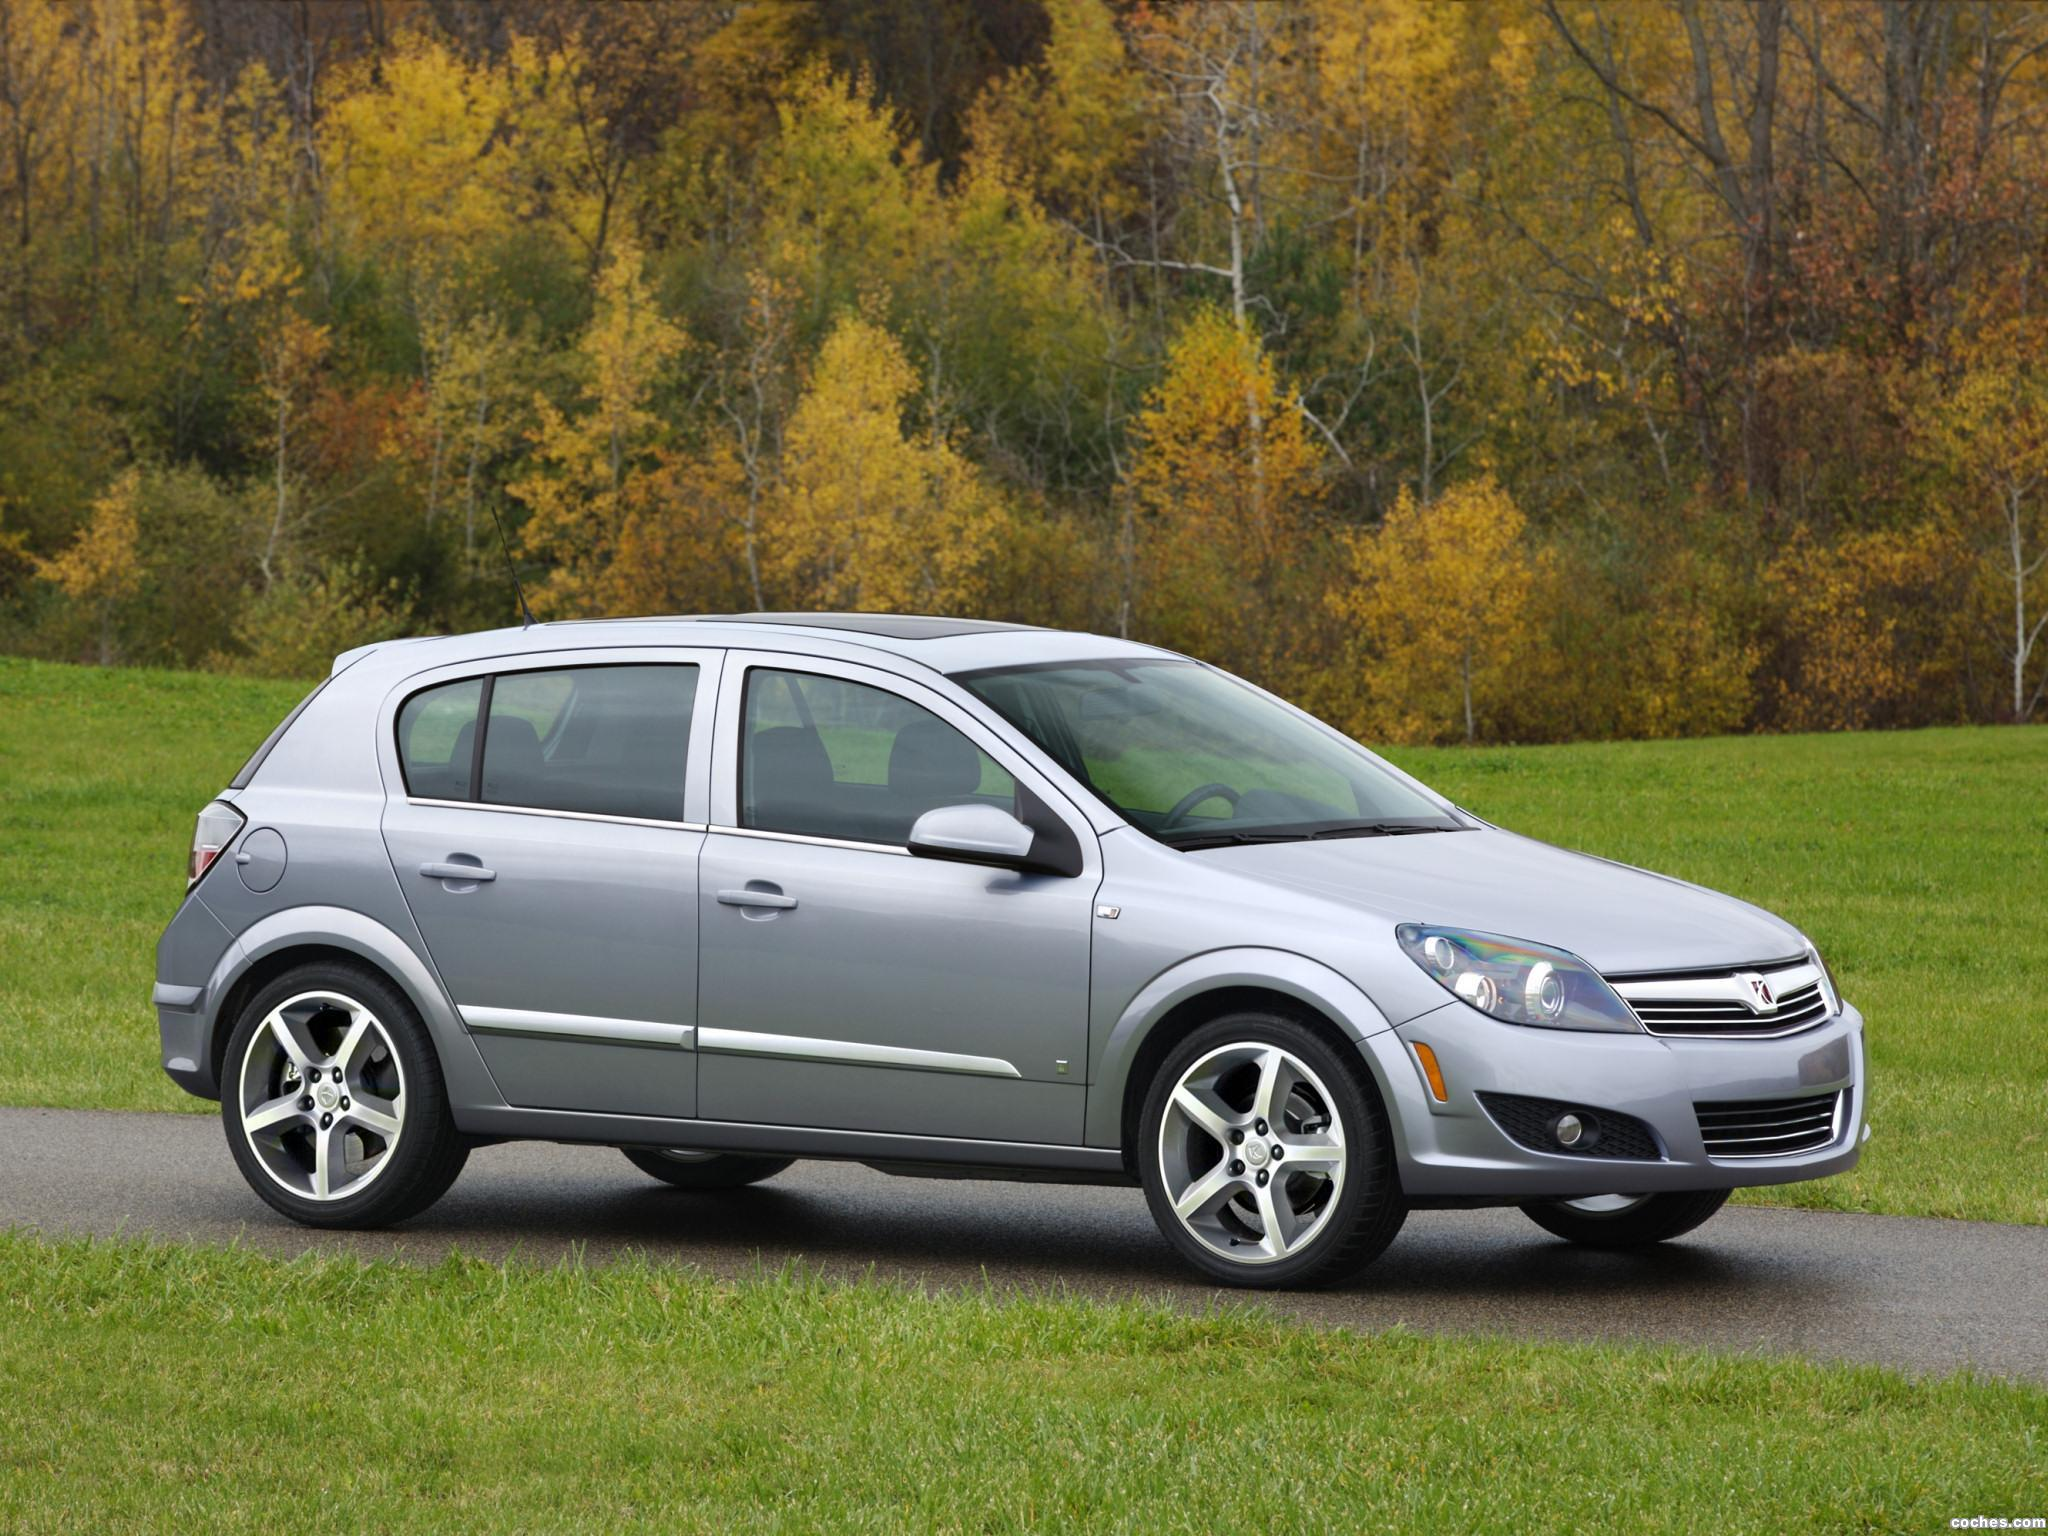 Foto 0 de Saturn Astra XR 5 puertas 2007